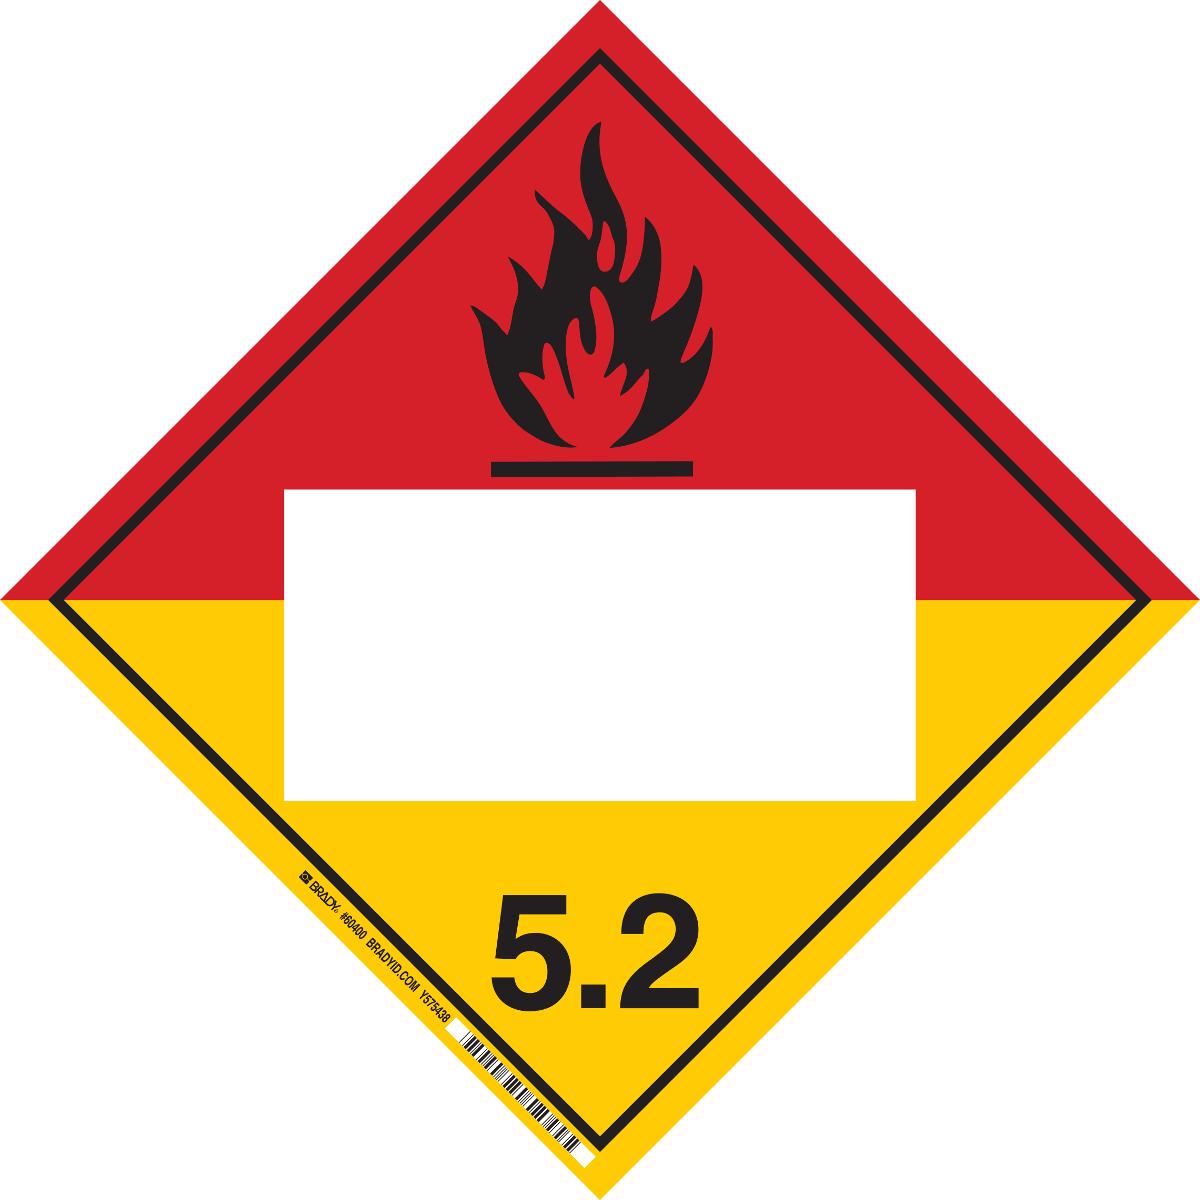 Brady® 60409 Diamond DOT Vehicle Placard Sign, 10-3/4 in W, B-120 Fiberglass, White Background, Red Legend